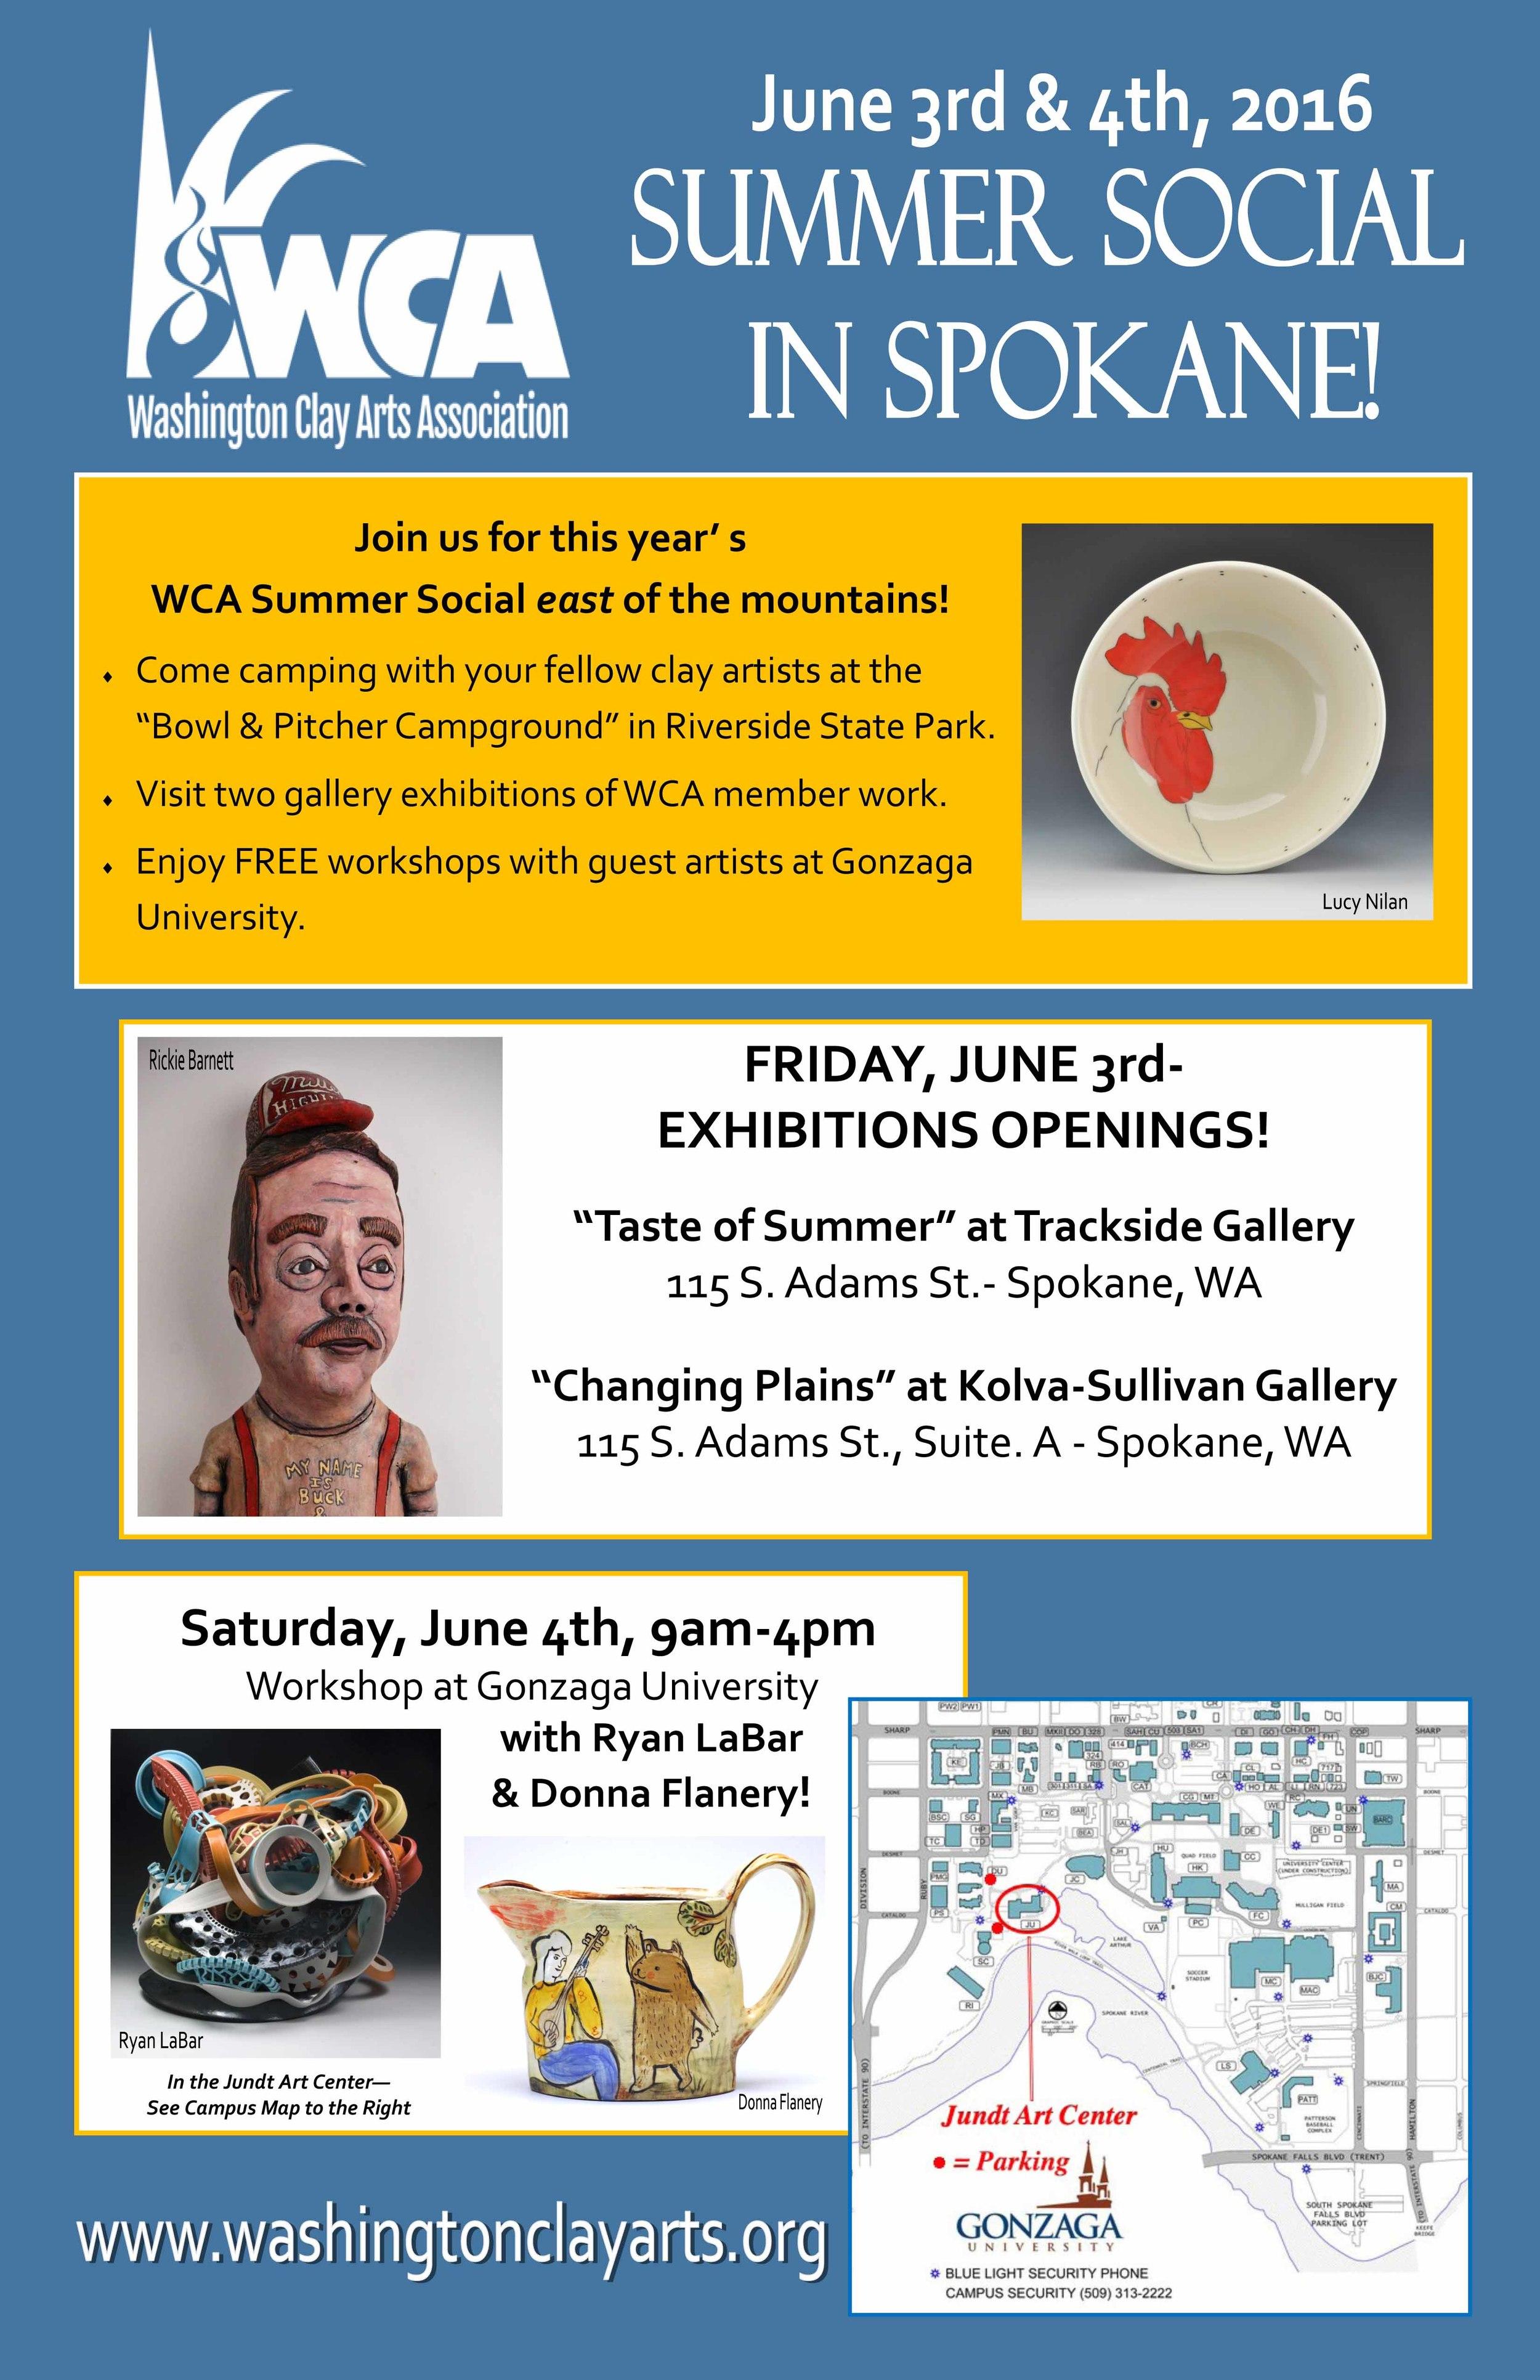 Washington Clay Arts Association